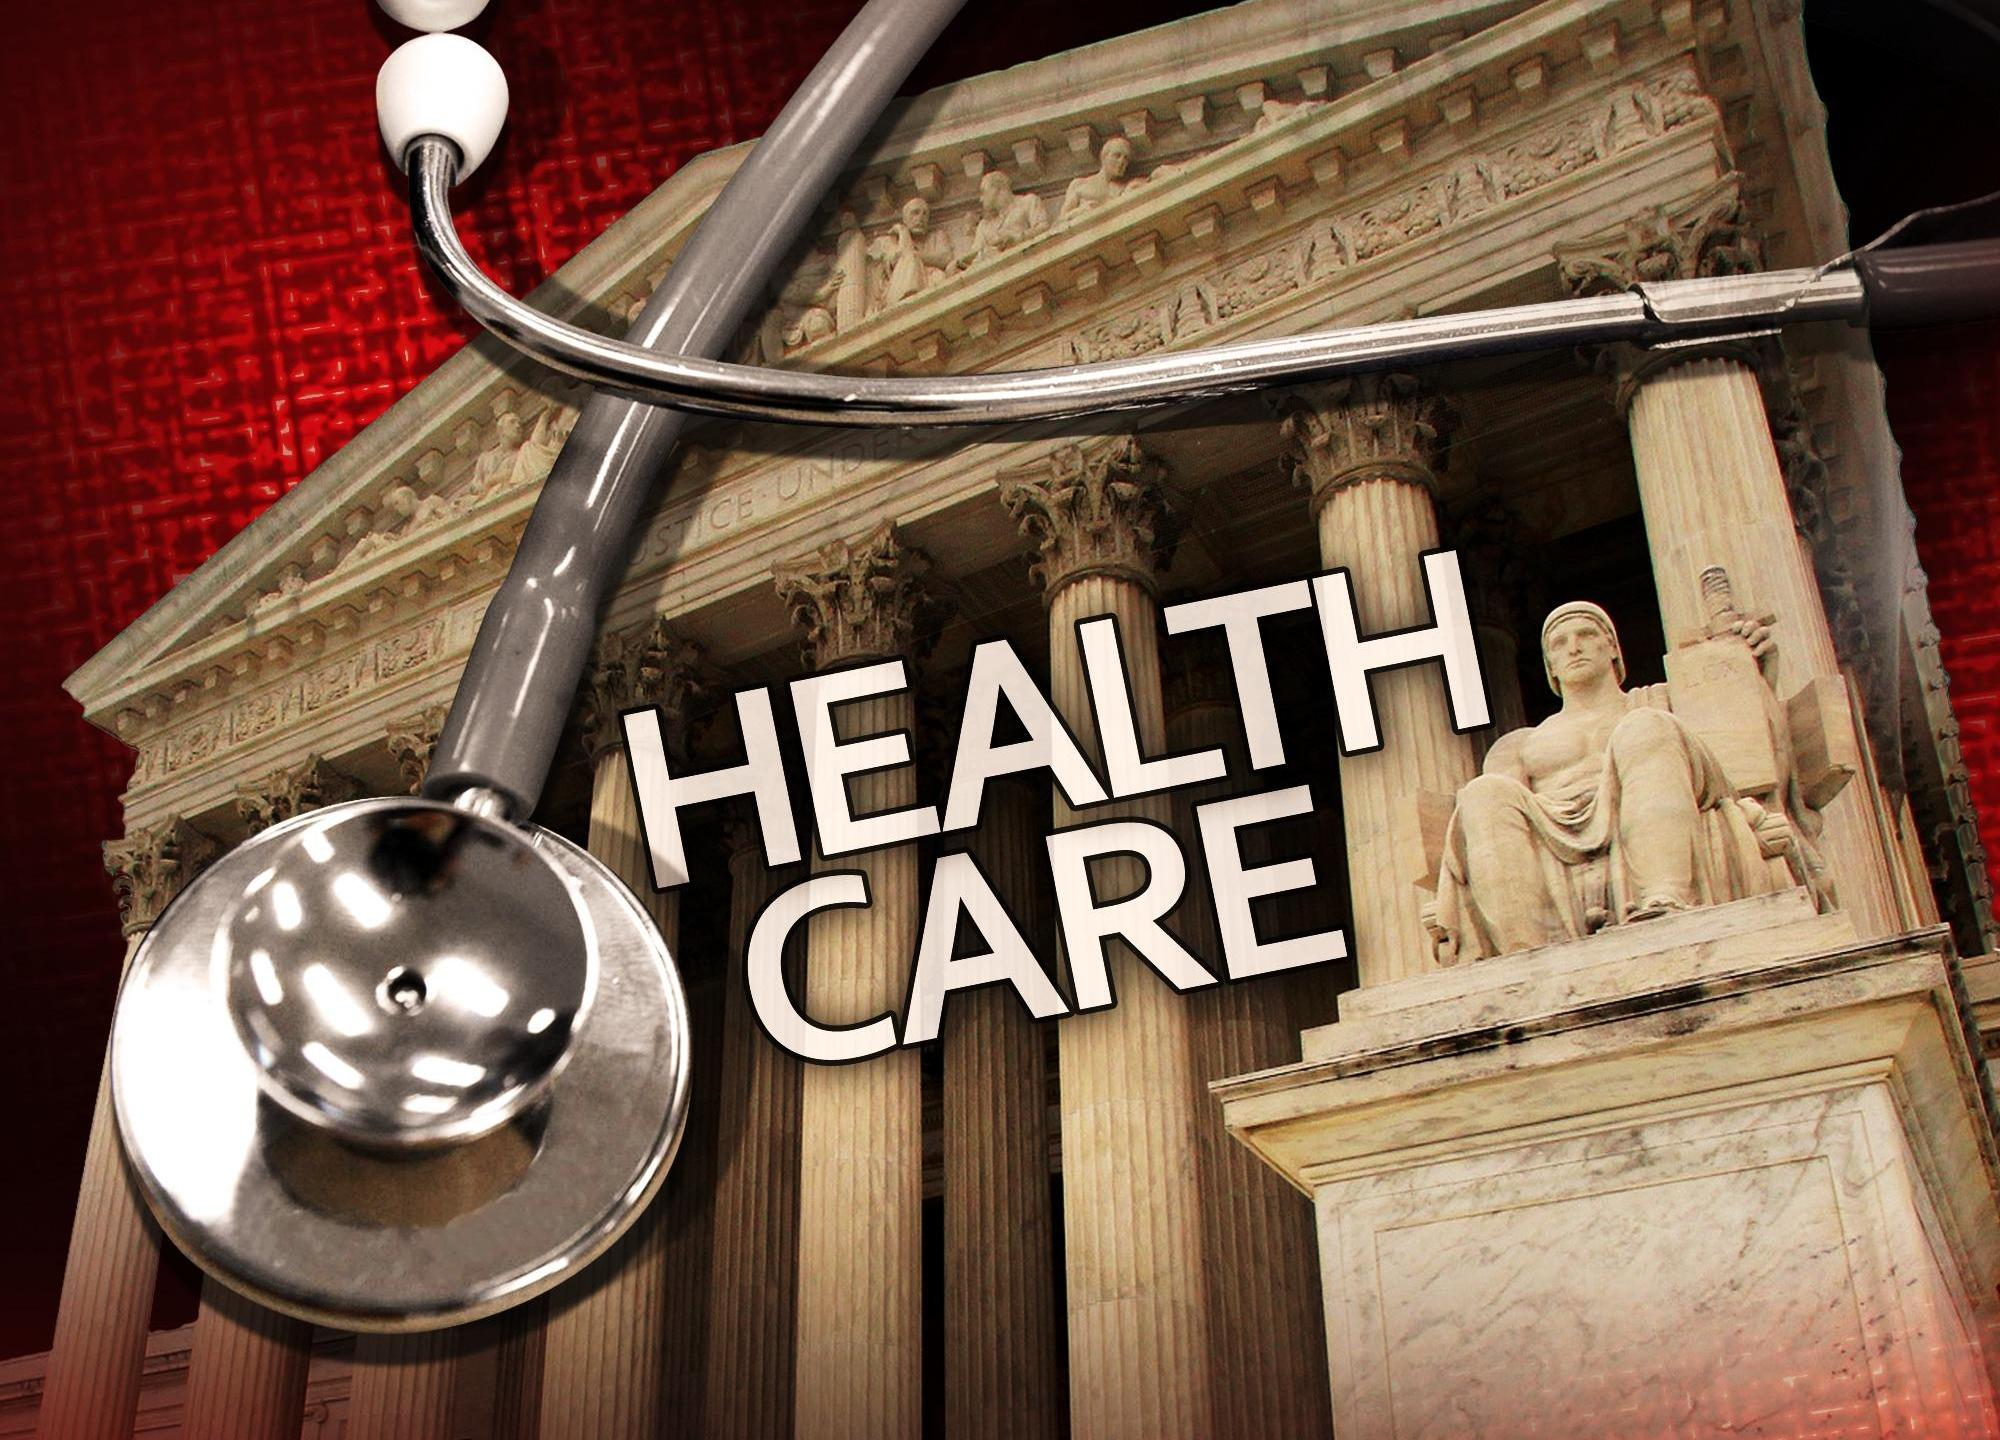 health care_216895